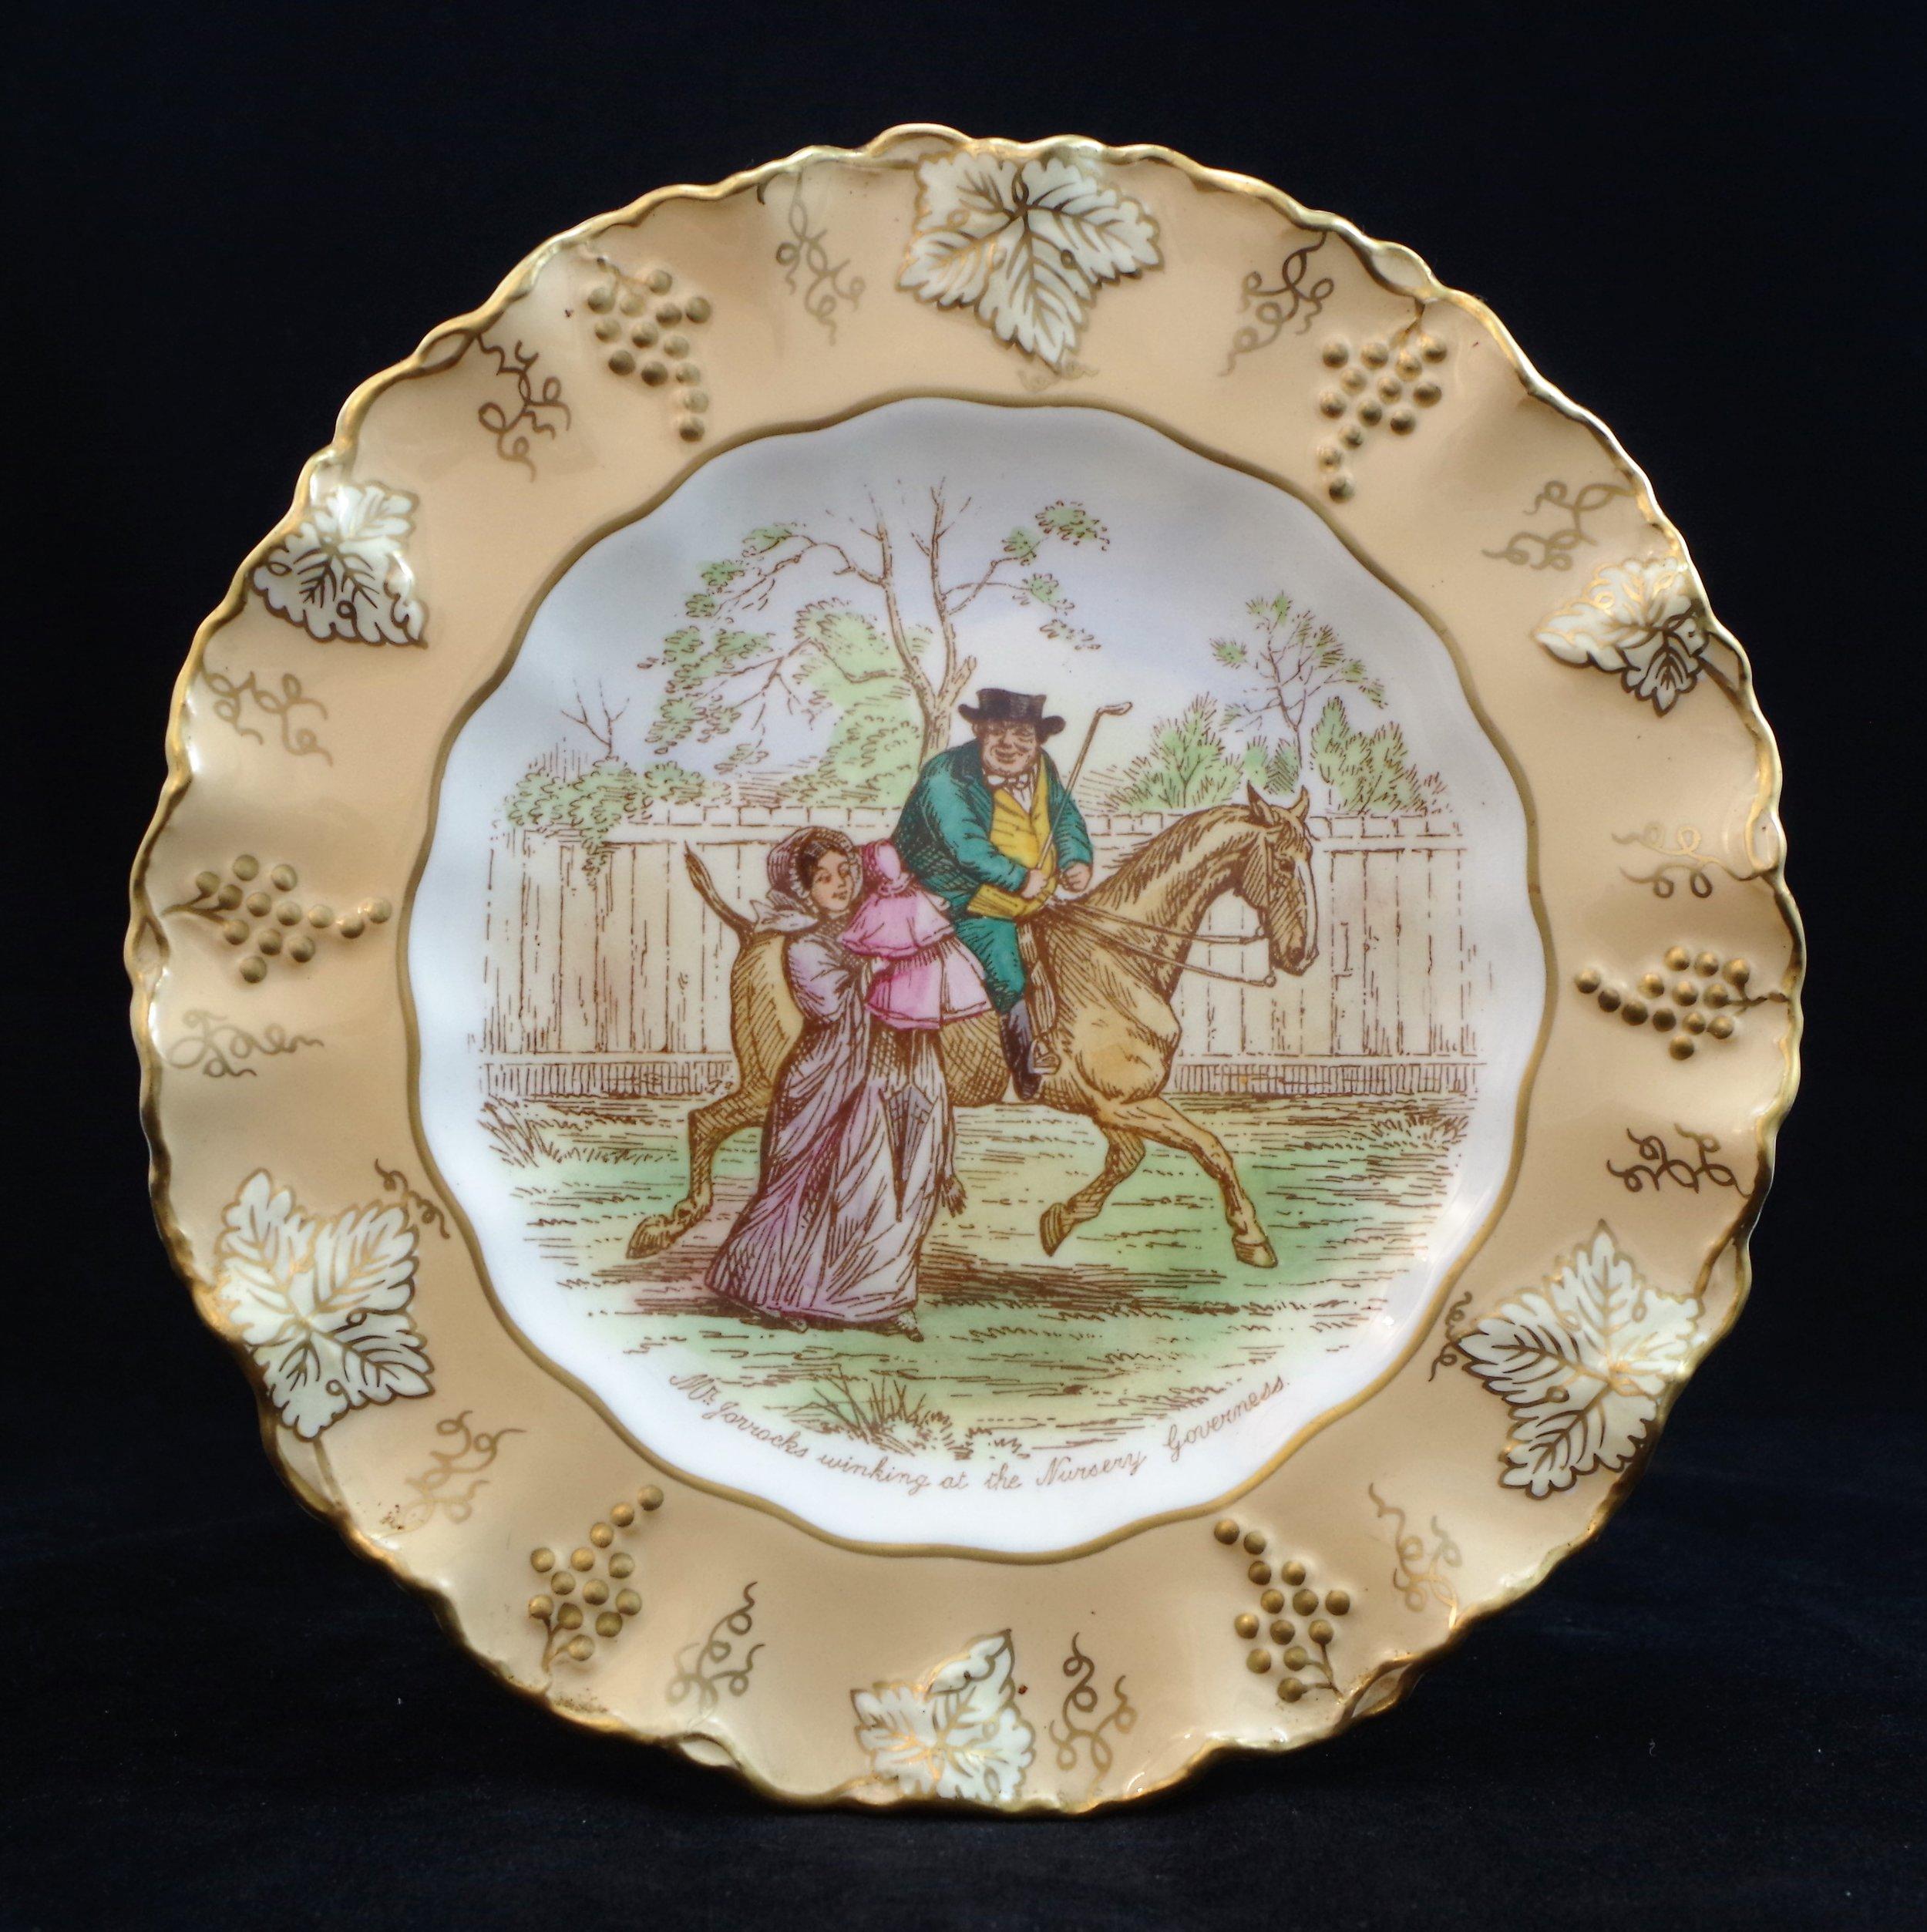 royal-crown-derby-vine-golden-fawn-ground-jorrocks-3